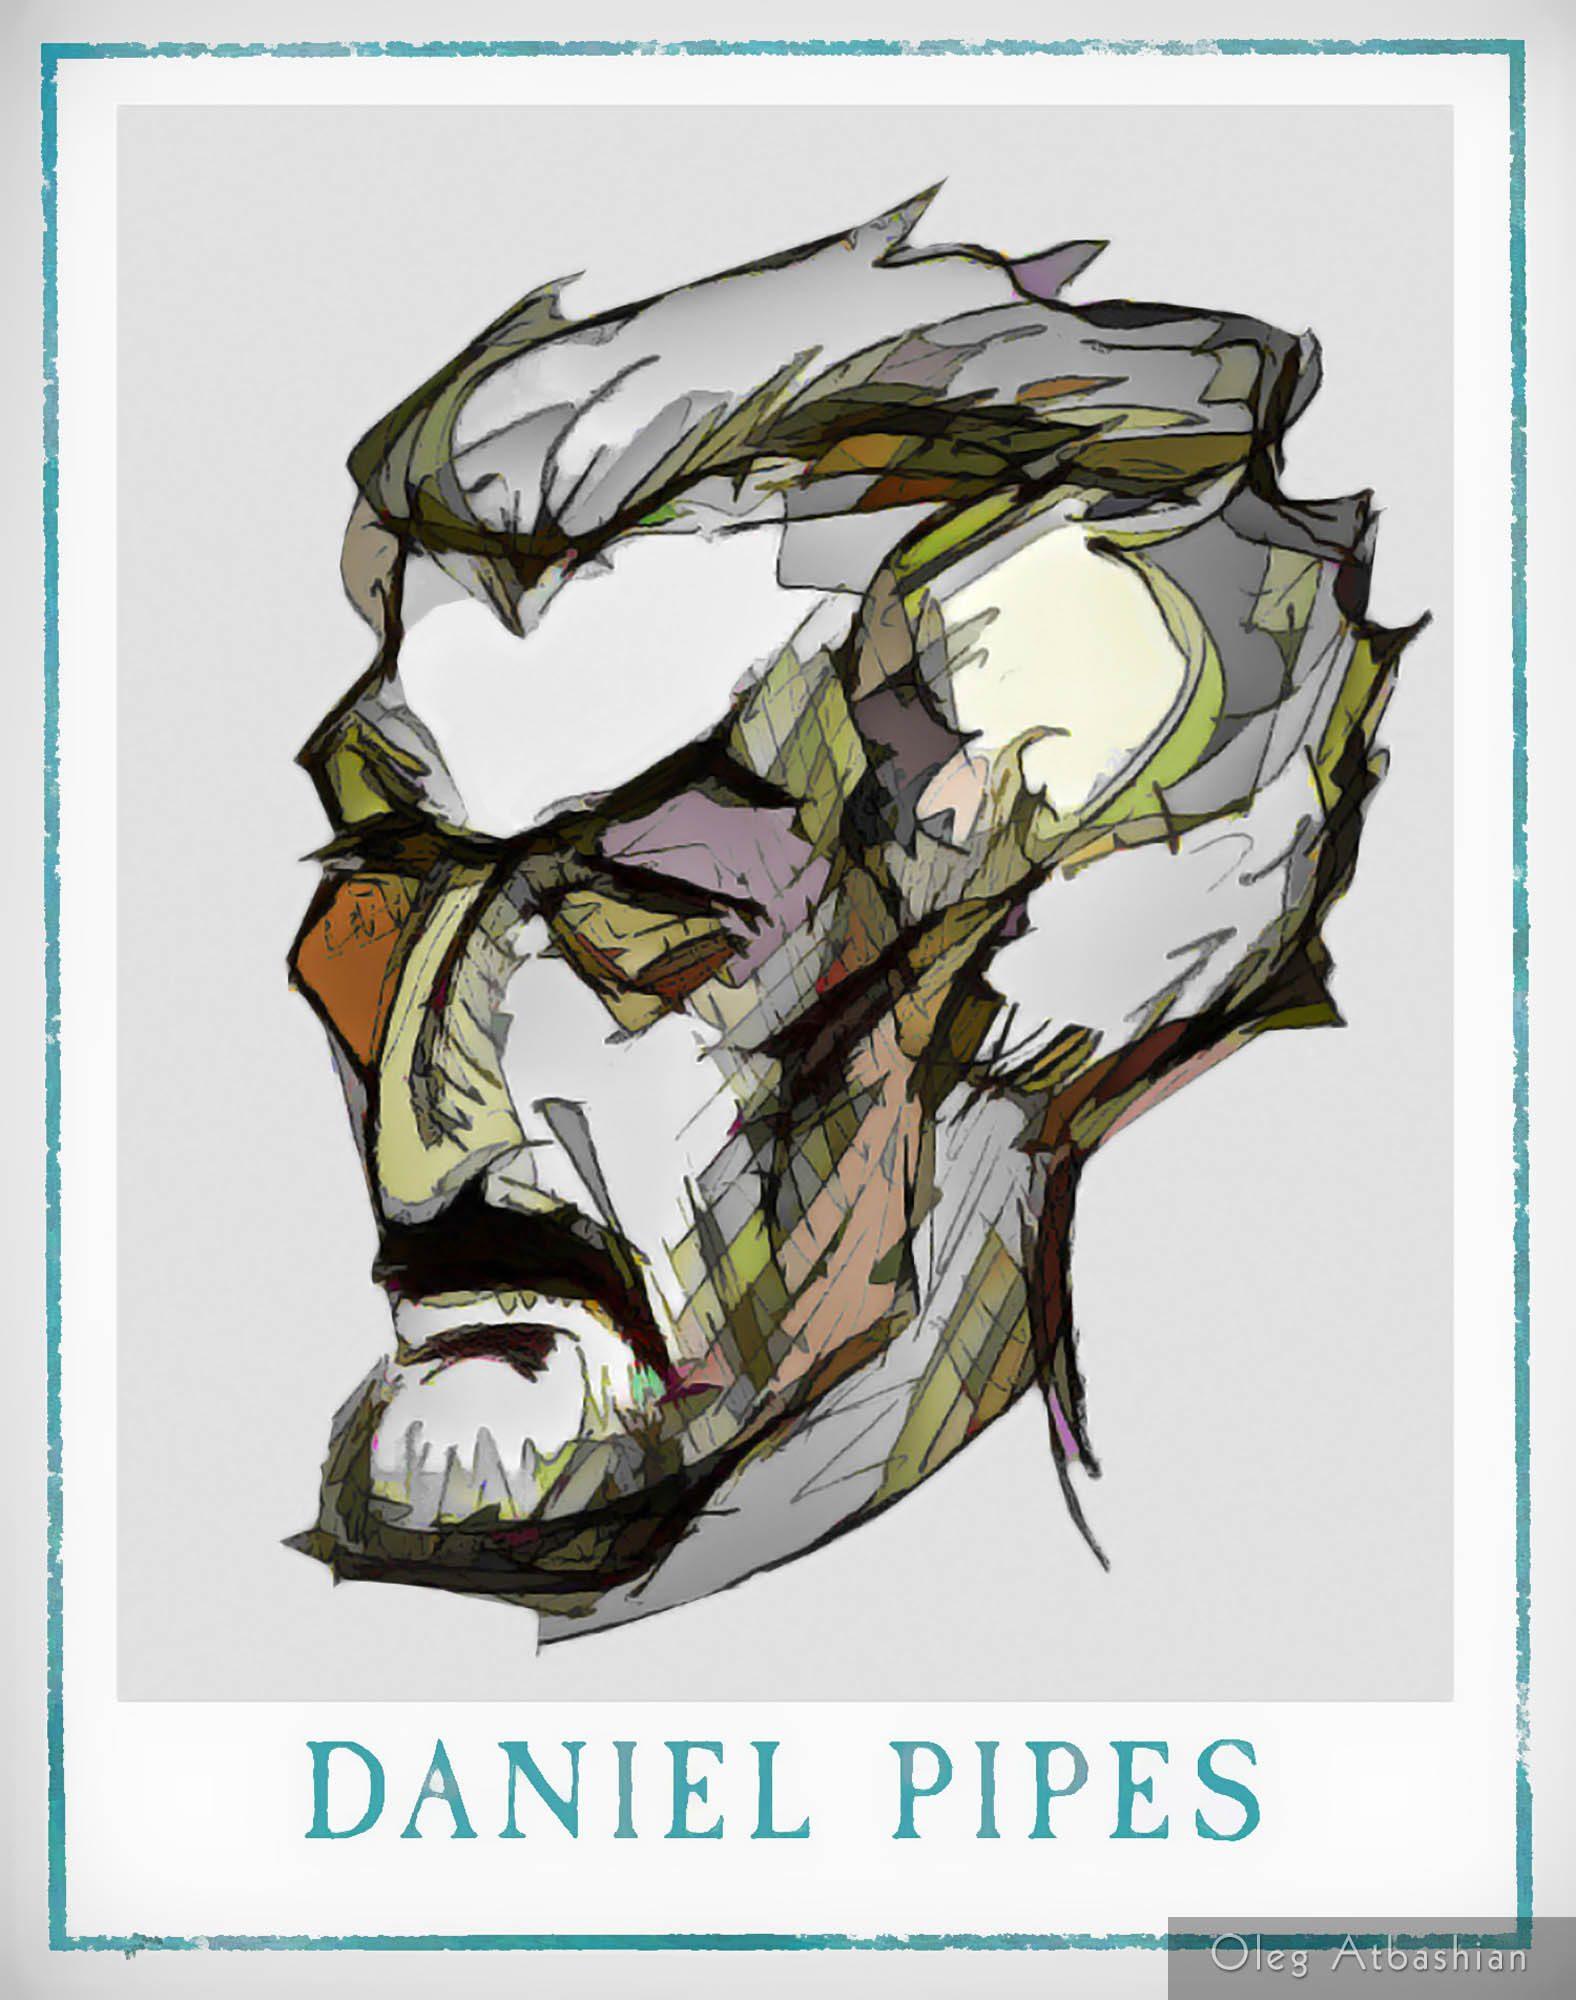 Cartoon: Daniel Pipes